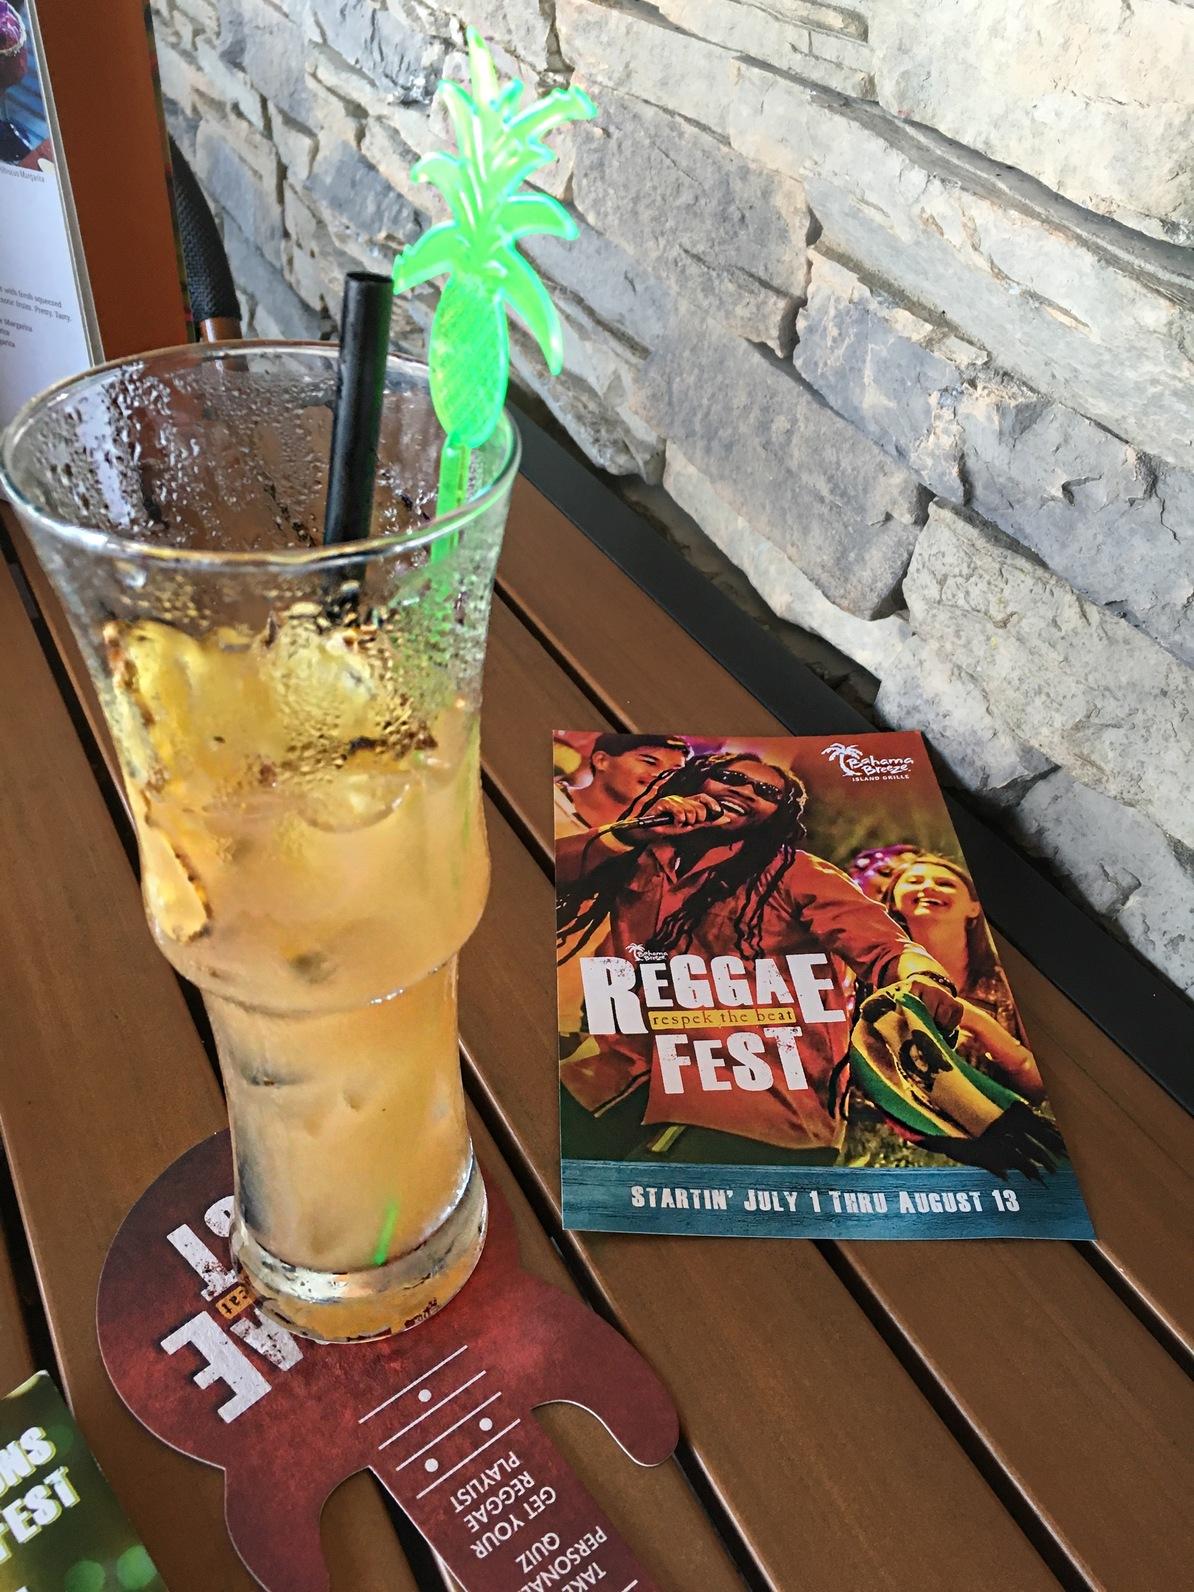 One Love cocktail at Bahama Breeze Reggae Fest